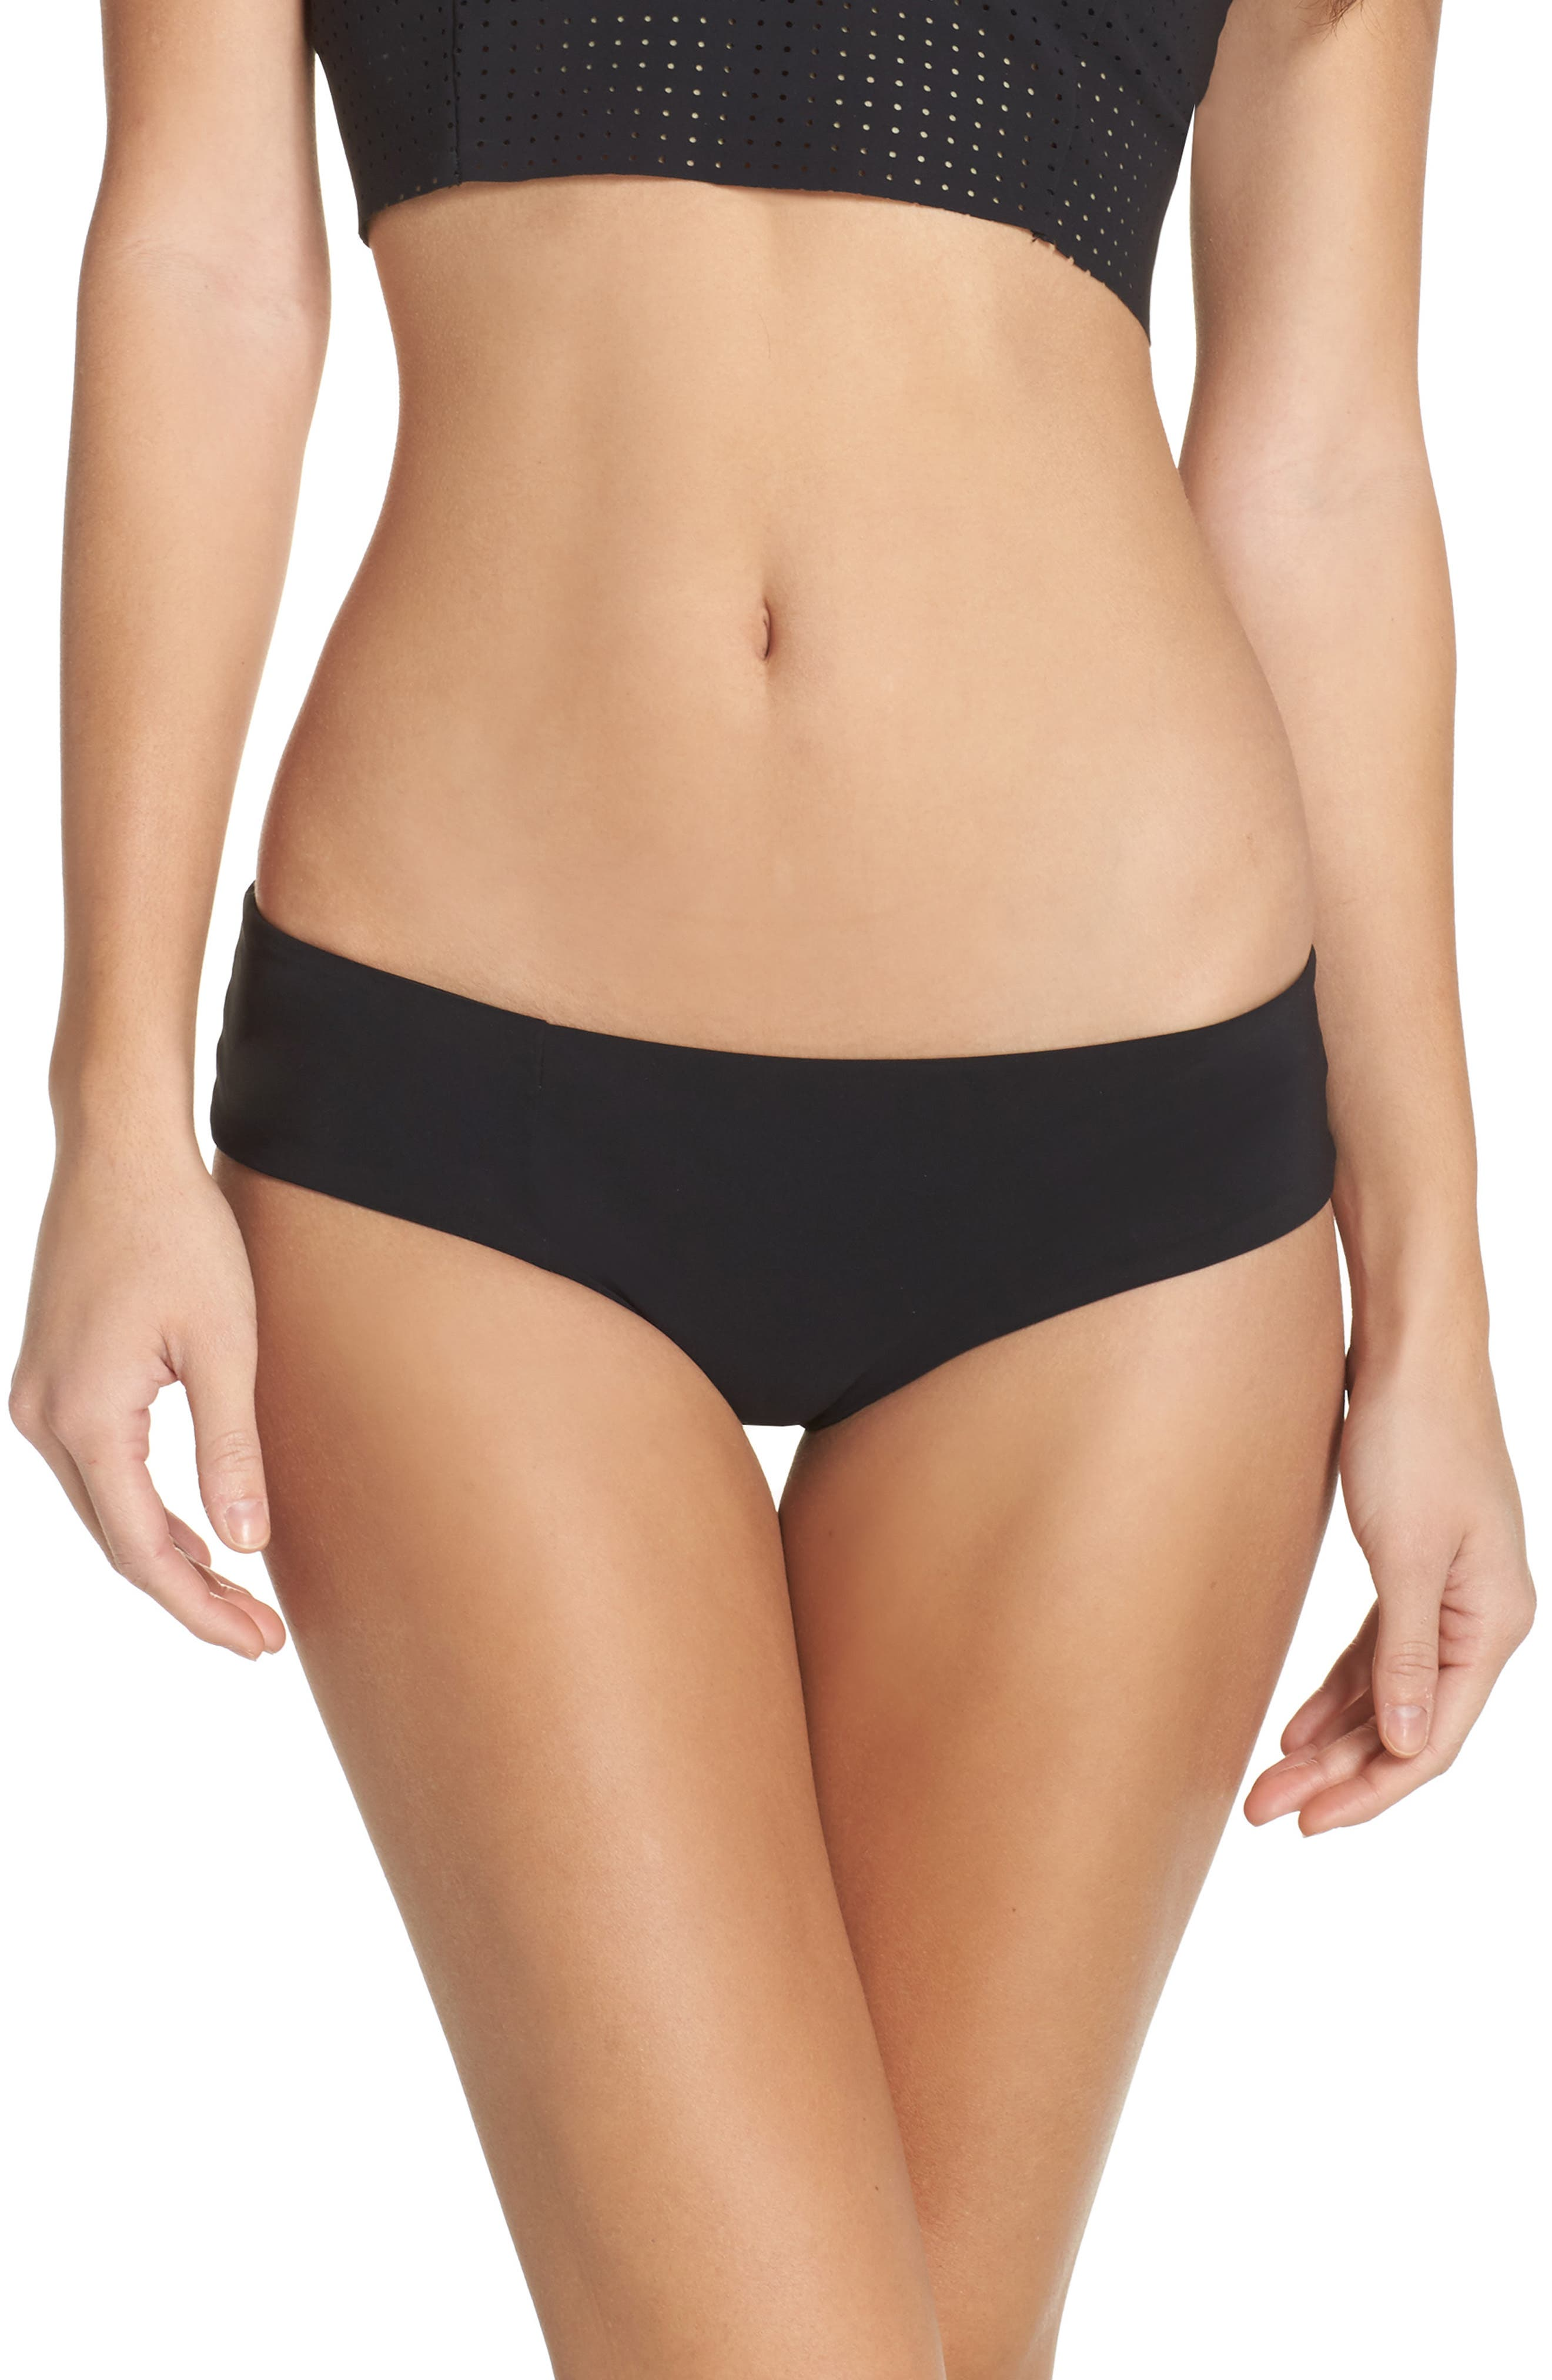 Wallace Bikini Bottoms,                         Main,                         color, Black